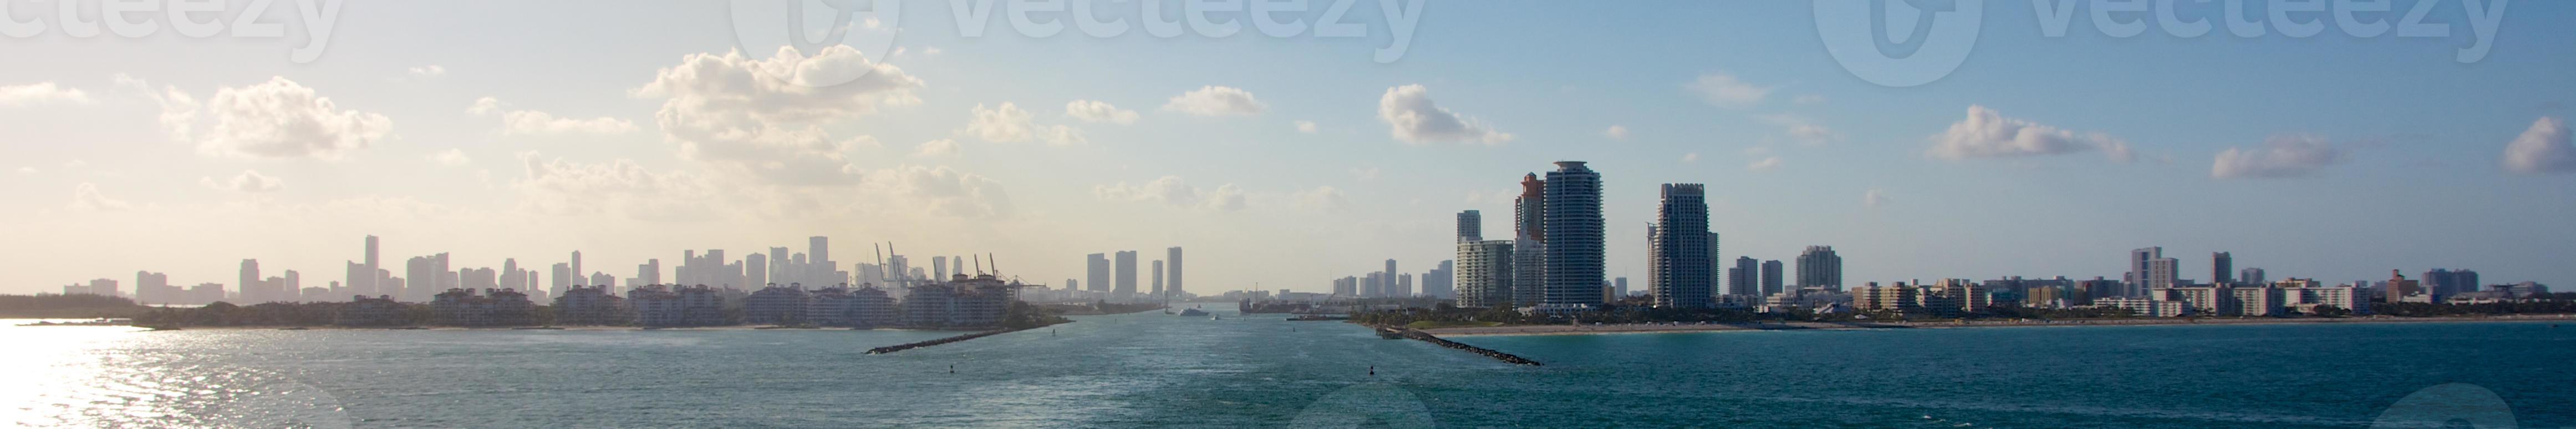 Miami Harbor Panorama photo